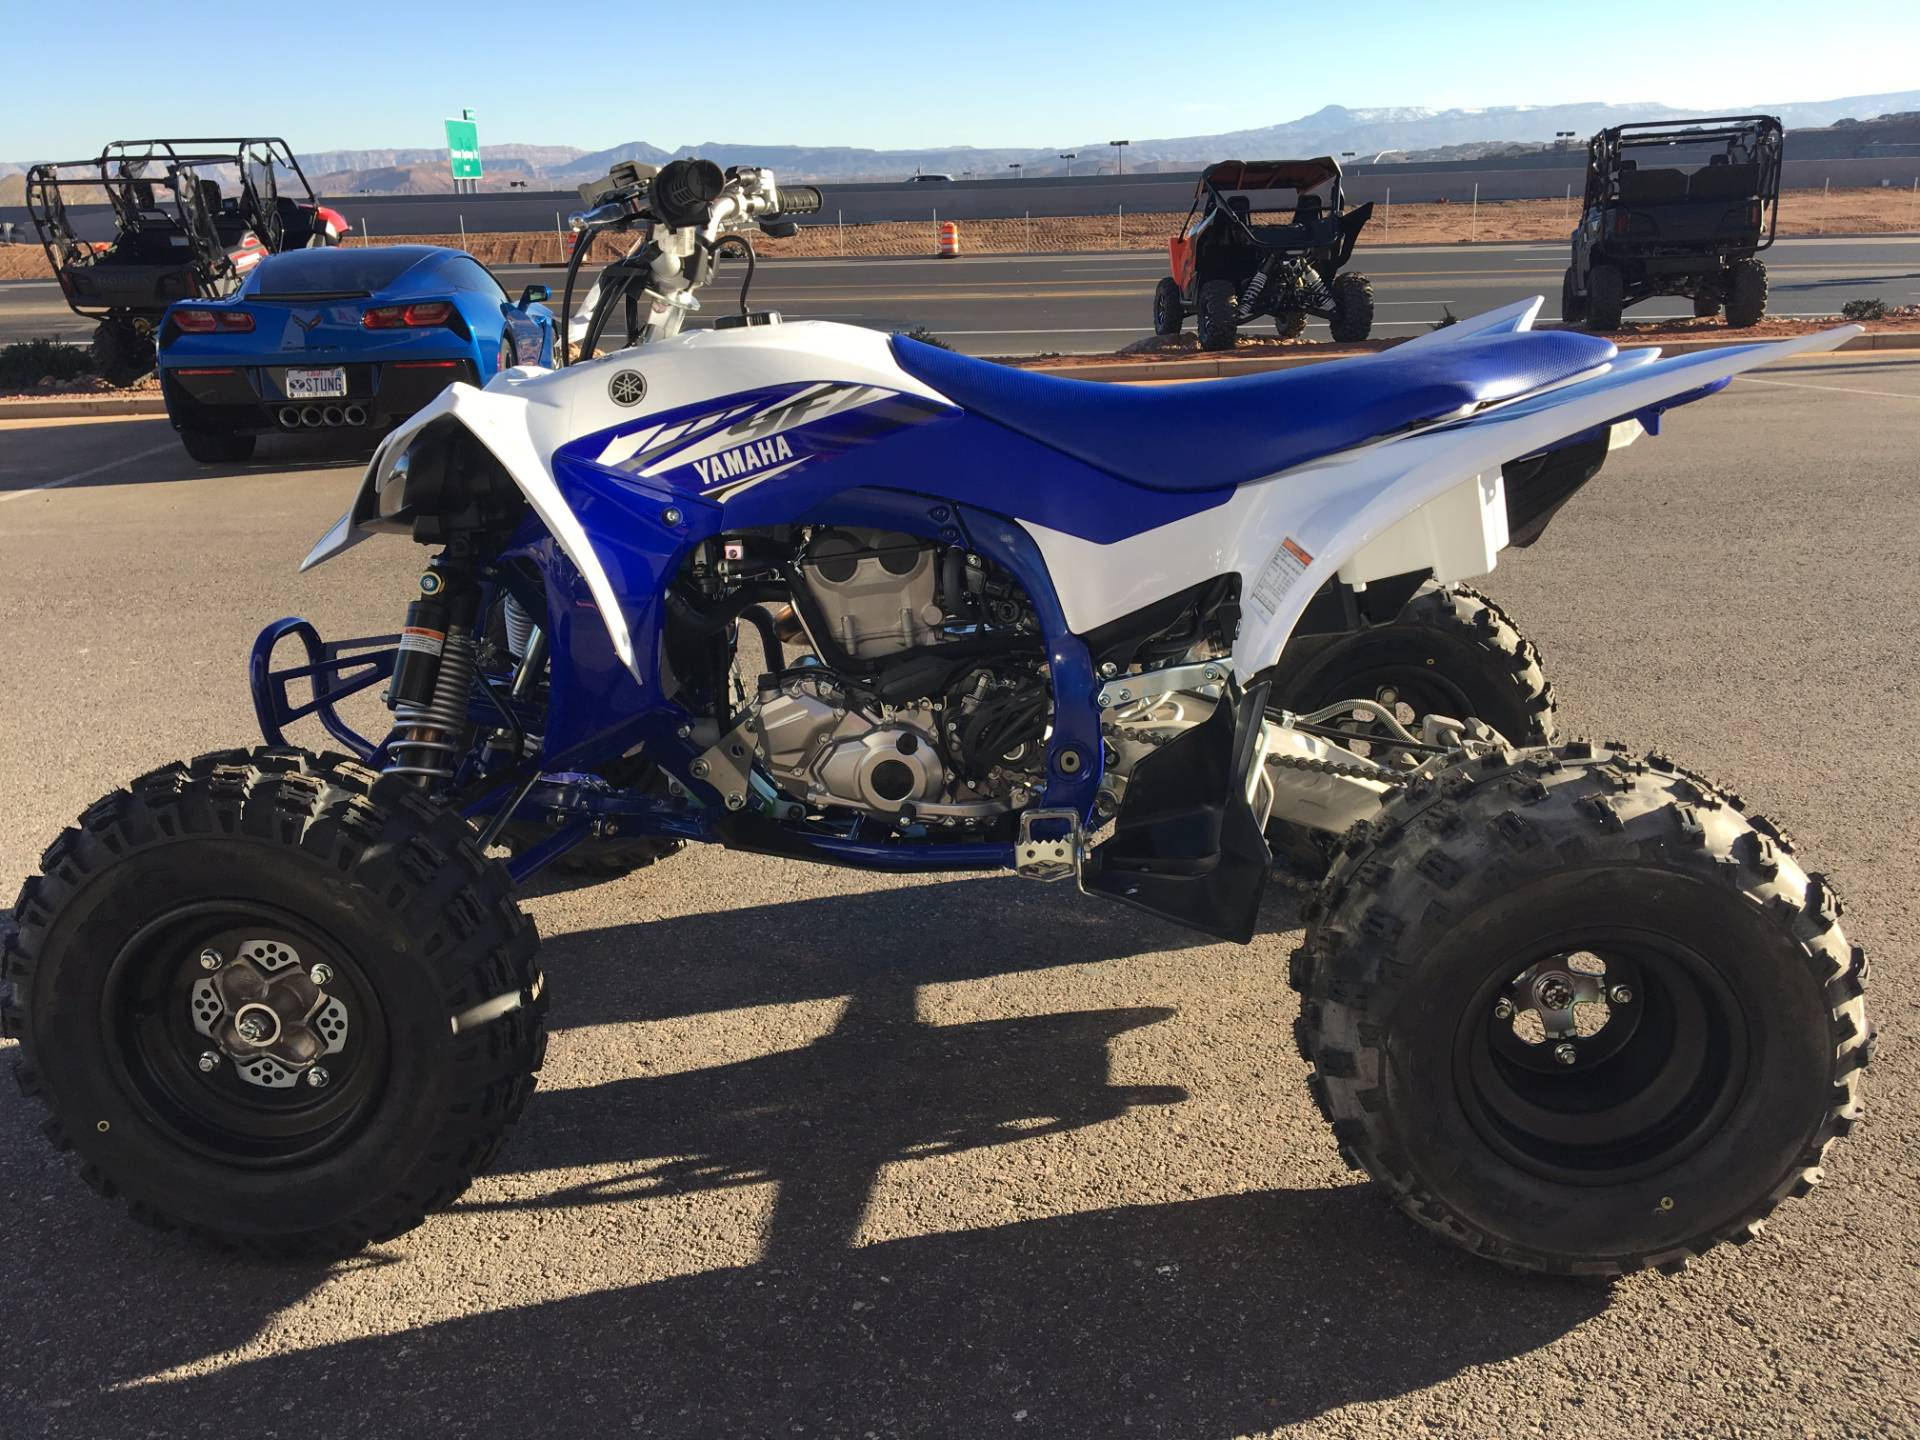 2017 Yamaha YFZ450R for sale 22727